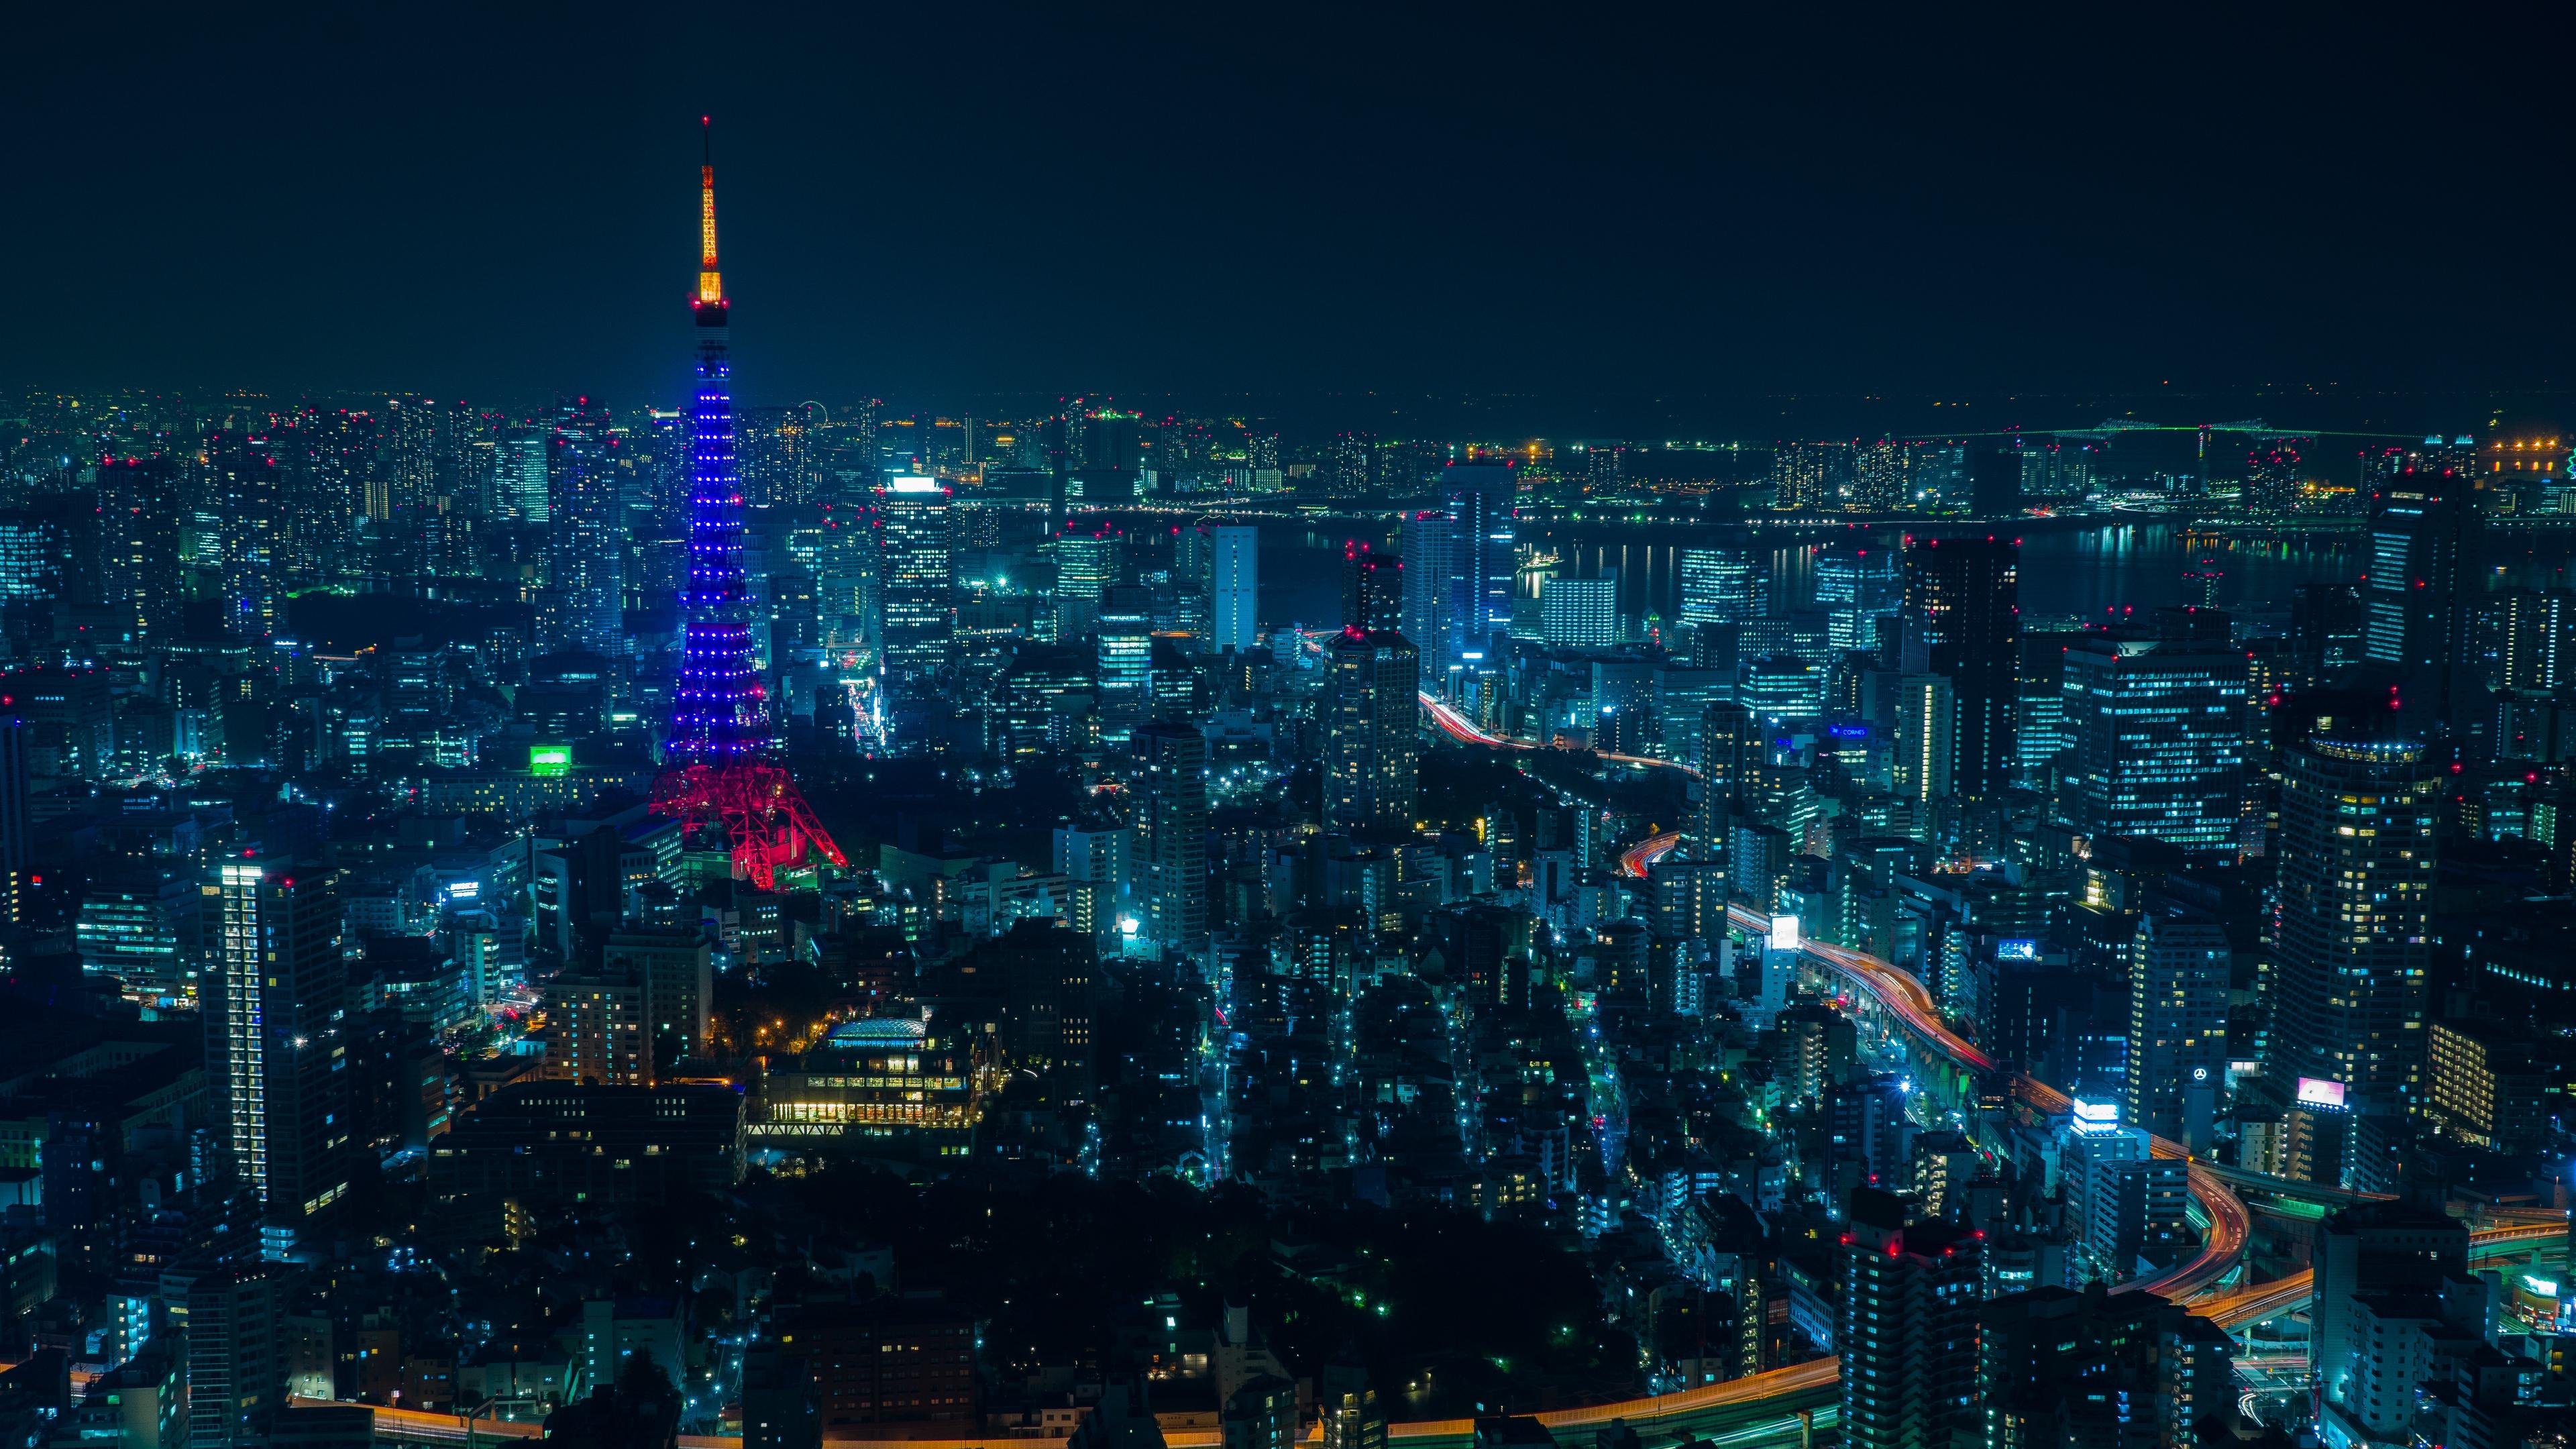 tokyo night city skyscrapers 4k 1538067528 - tokyo, night city, skyscrapers 4k - Tokyo, Skyscrapers, night city